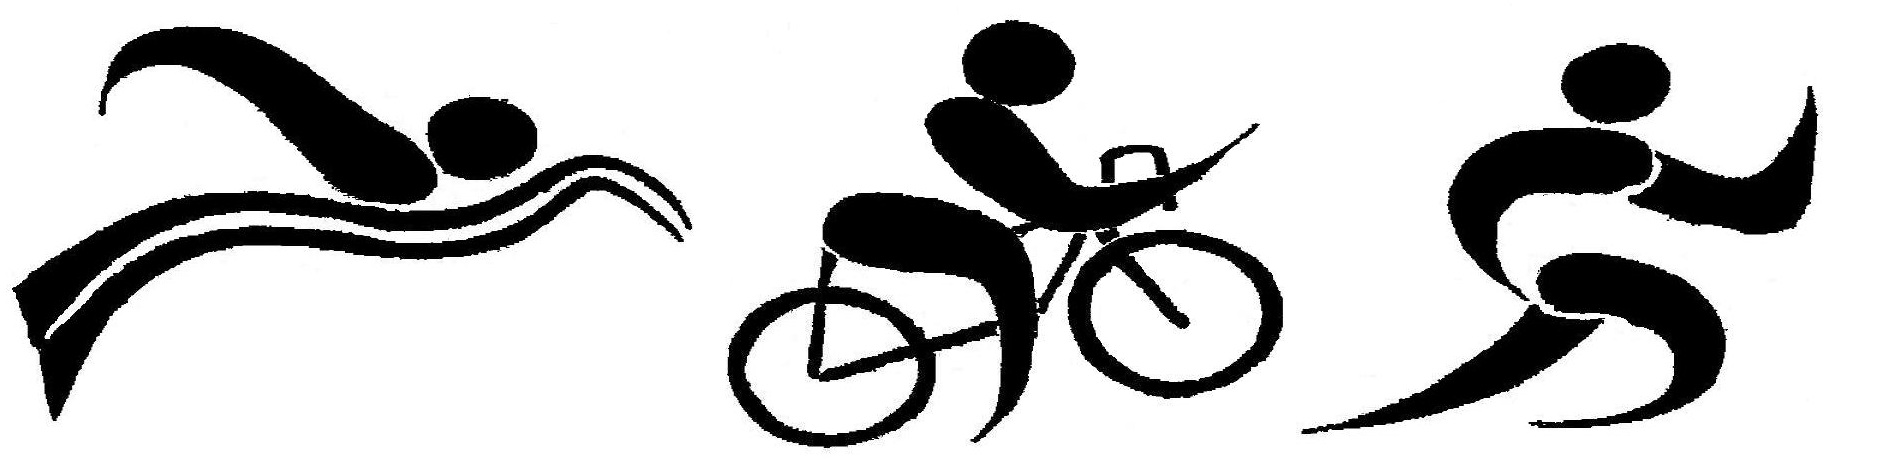 Triathlon Clipart-triathlon clipart-6